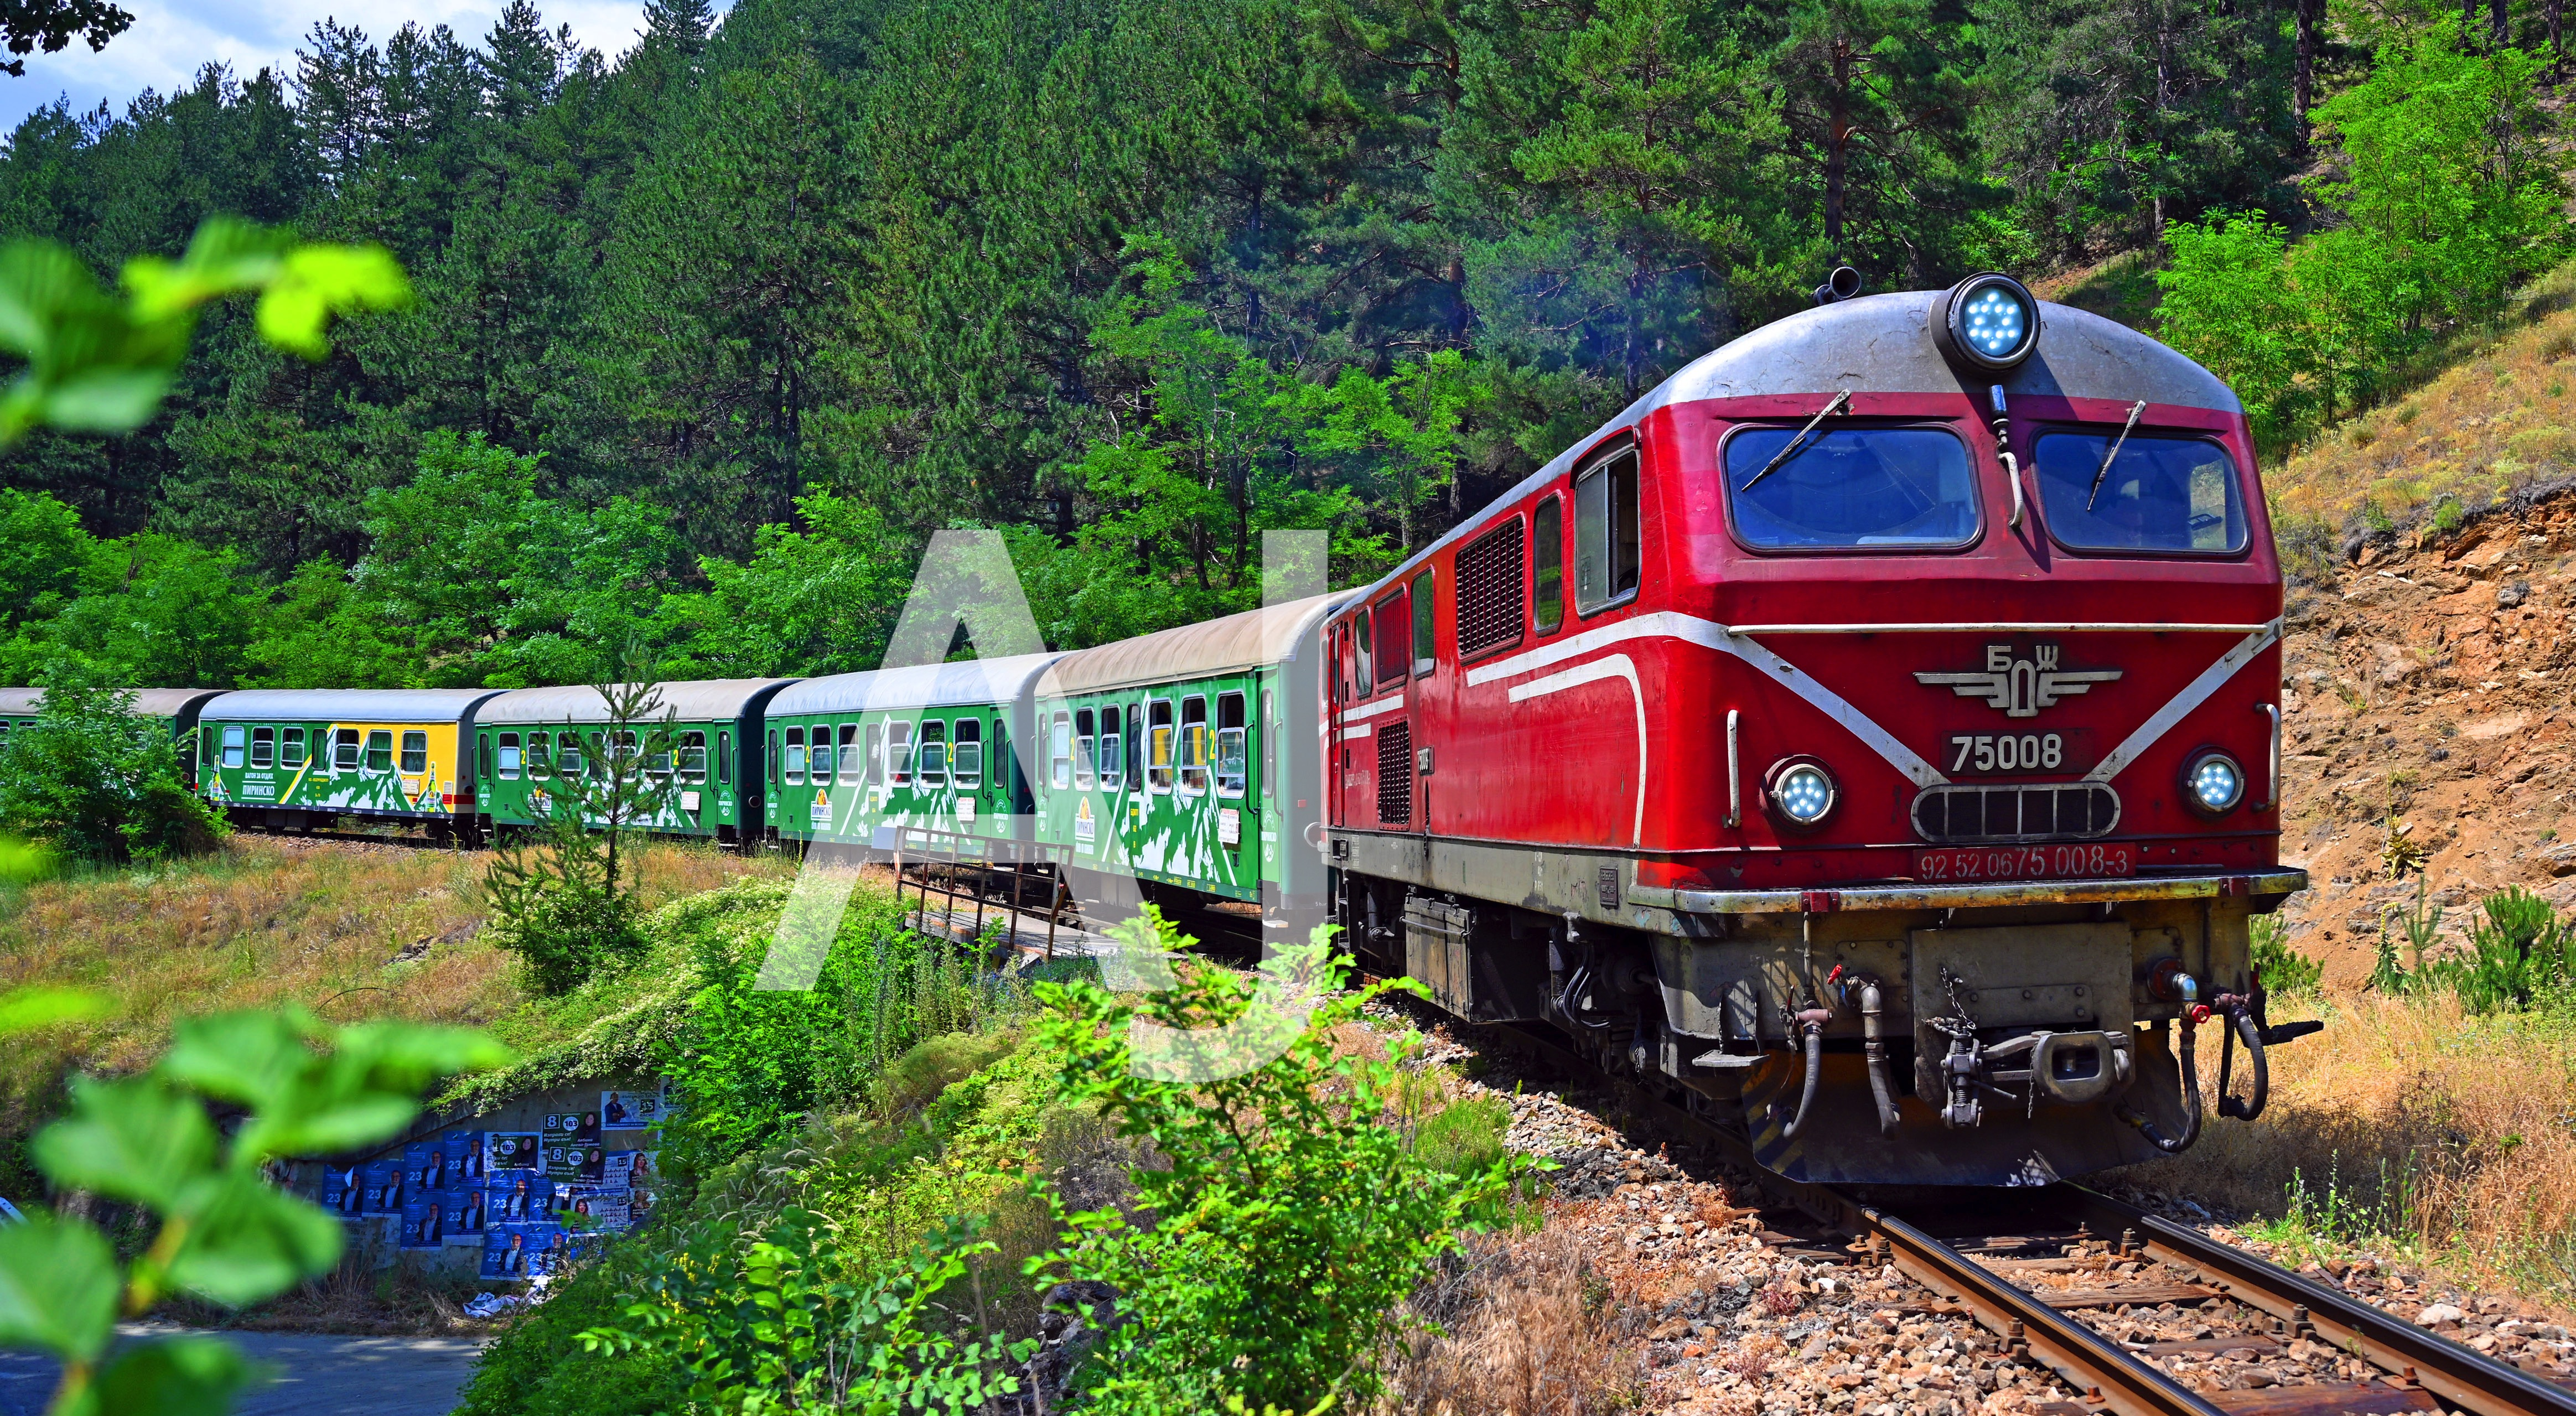 <i>Rhodopes Narrow Gauge Railway, General Kowatschew (Bulgaria)<i>